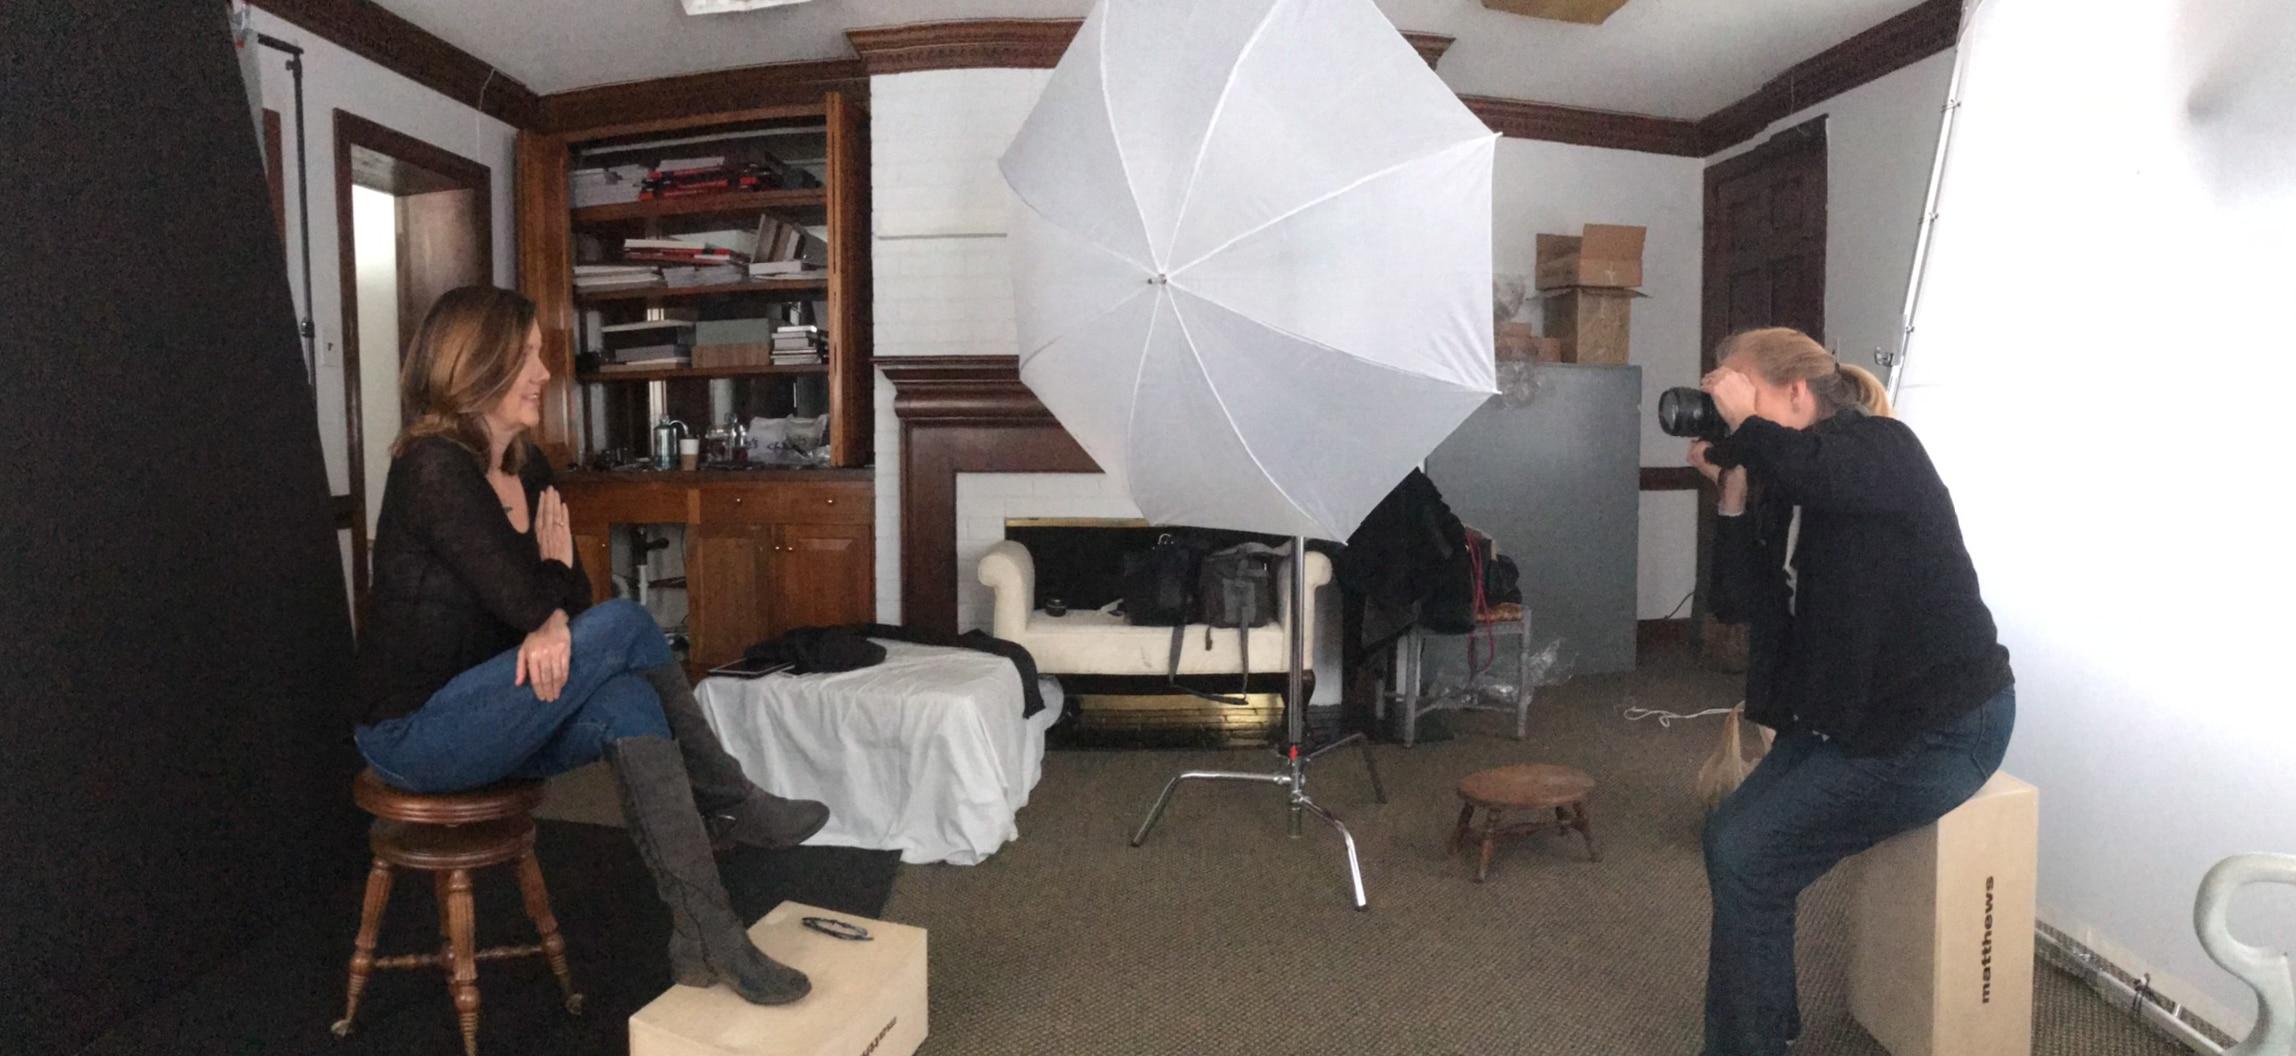 dream photoshoot behind the scenes